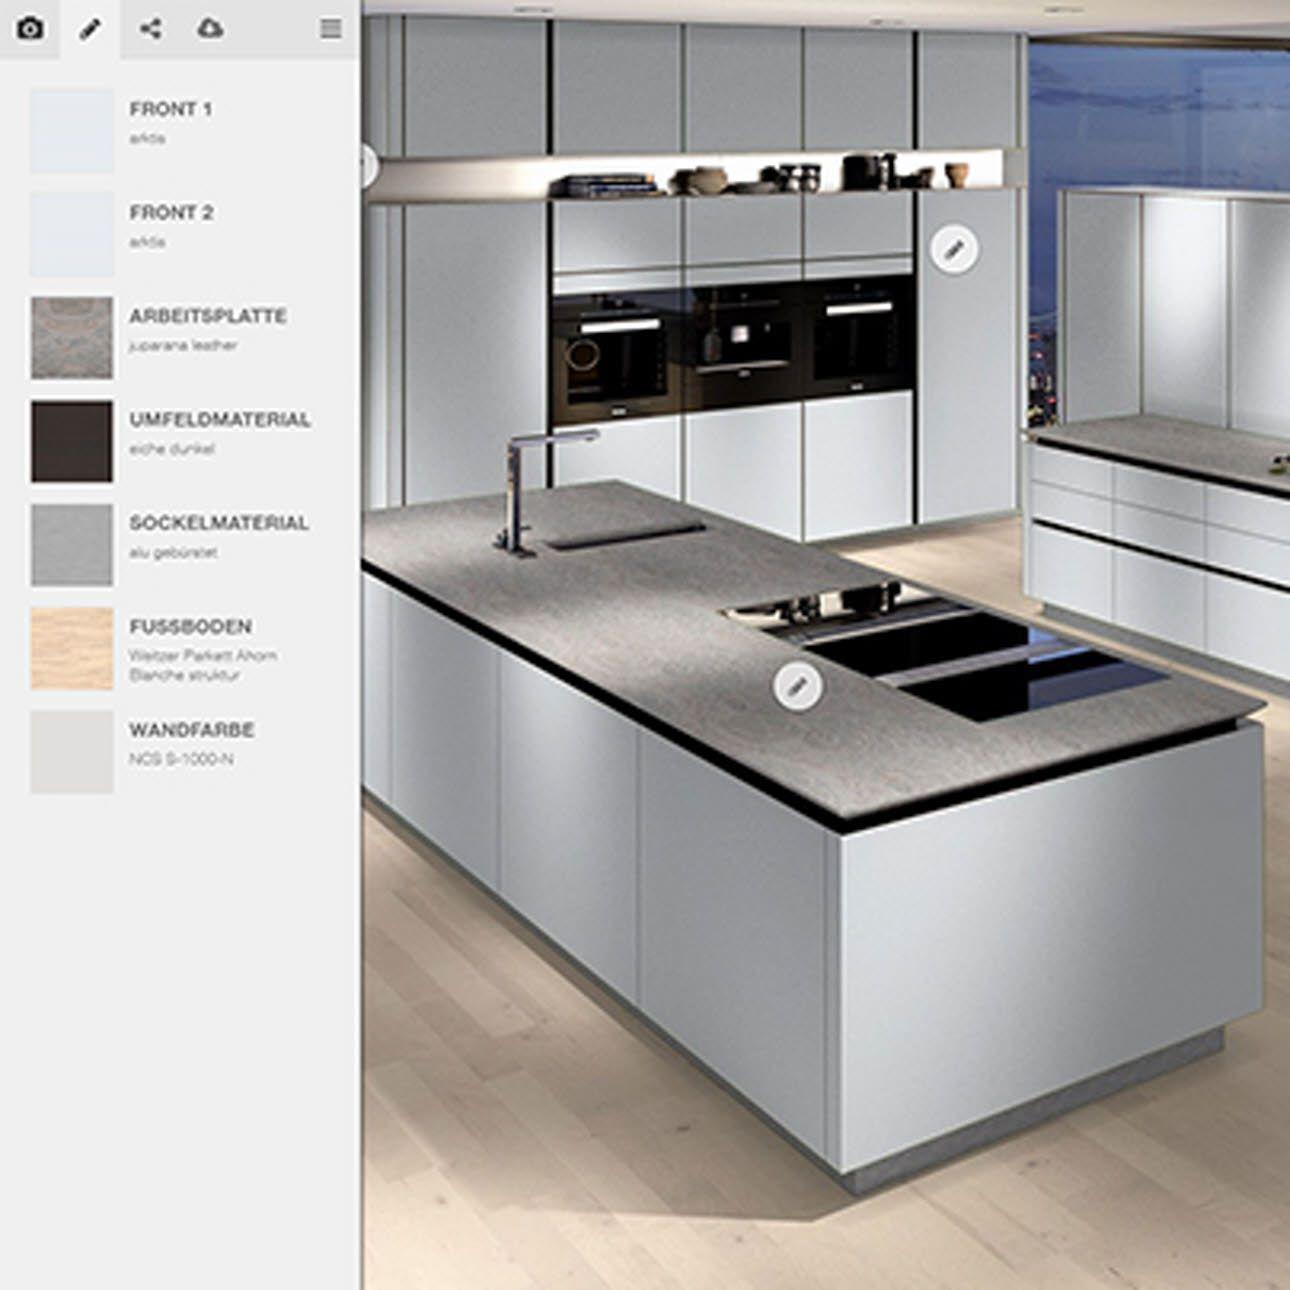 Intuo Configurator Kuche Planen Kuchen Aktuell Haus Kuchen